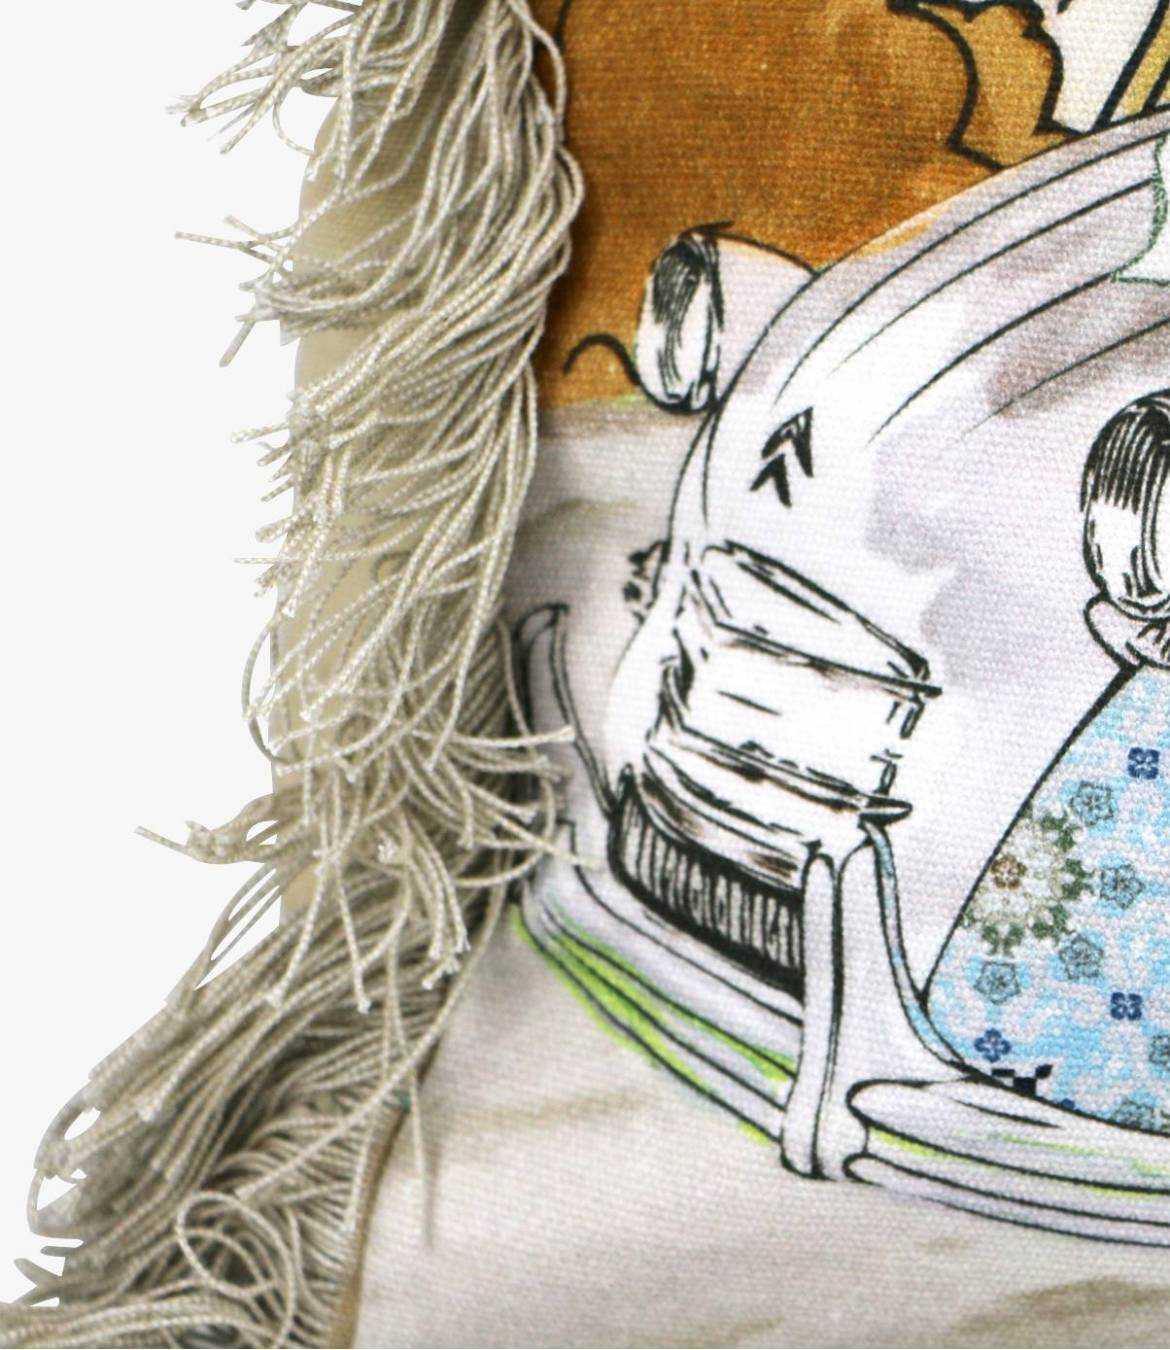 CRUISE - GAMME VOYAGE Women's Cotton Bag 40x30x15 cm Storiatipic - 6